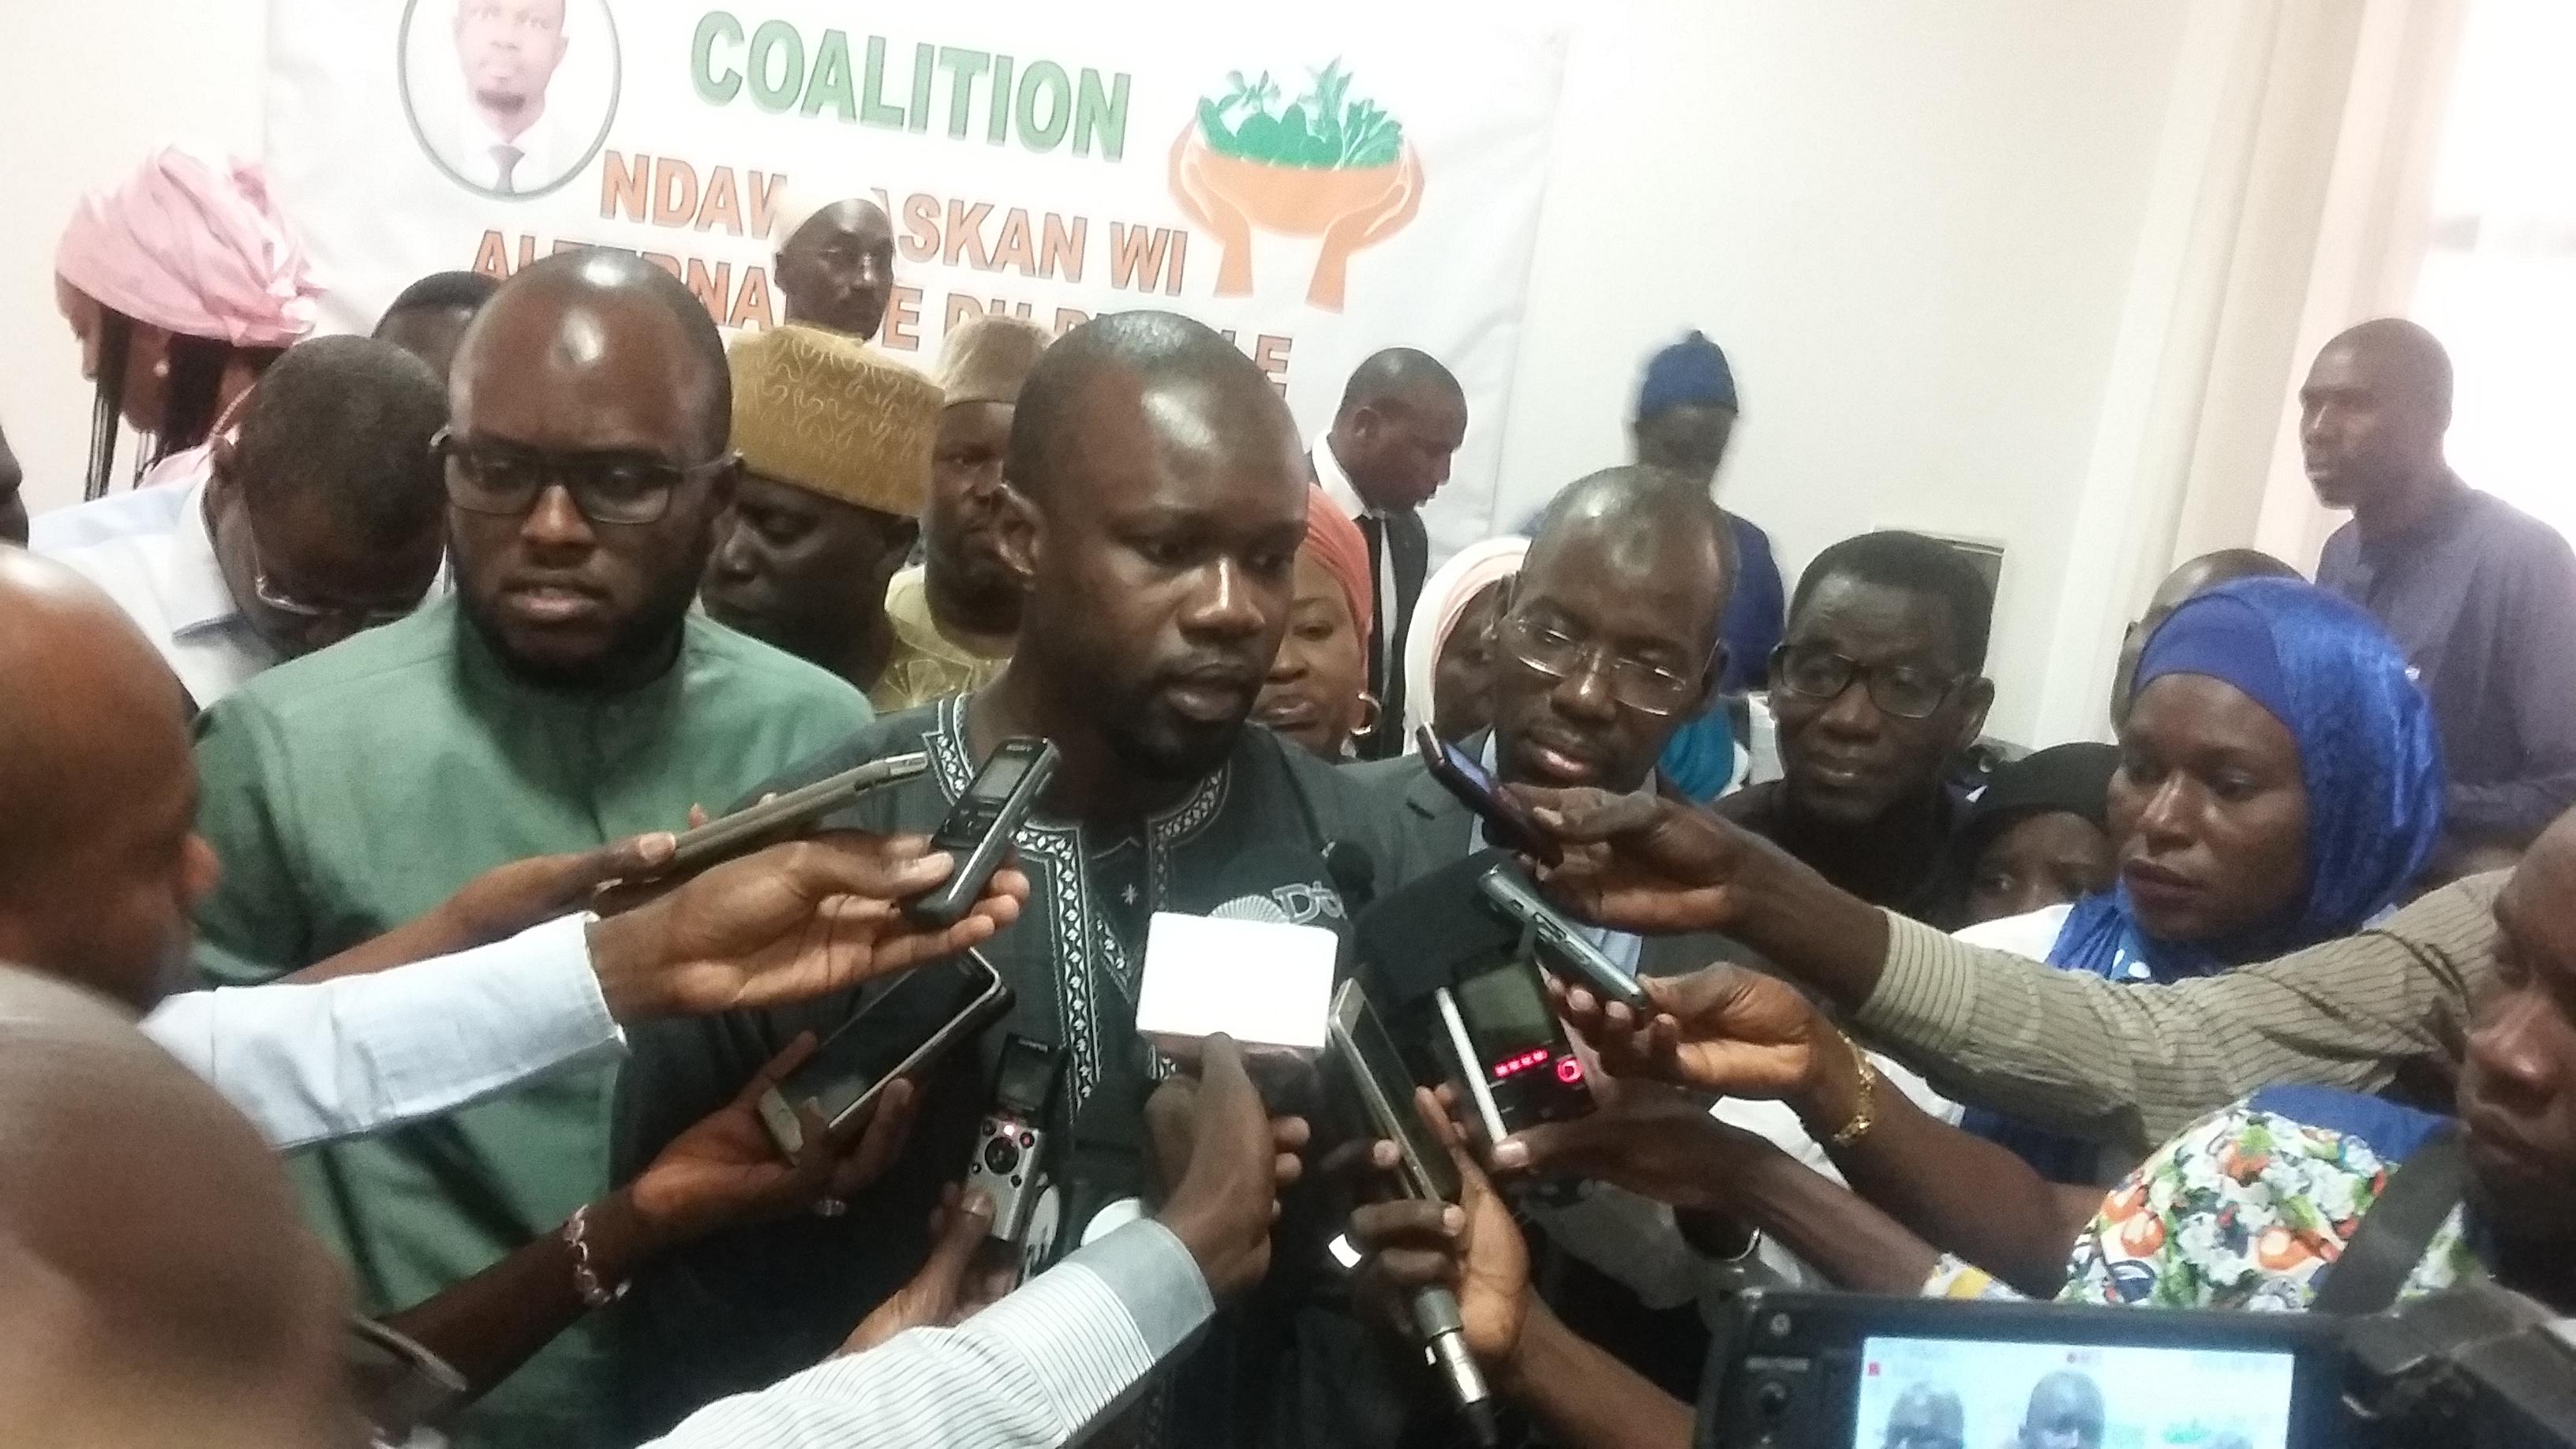 ZIGUINCHOR : Ousmane Sonko déplore « la désorganisation organisée » du scrutin